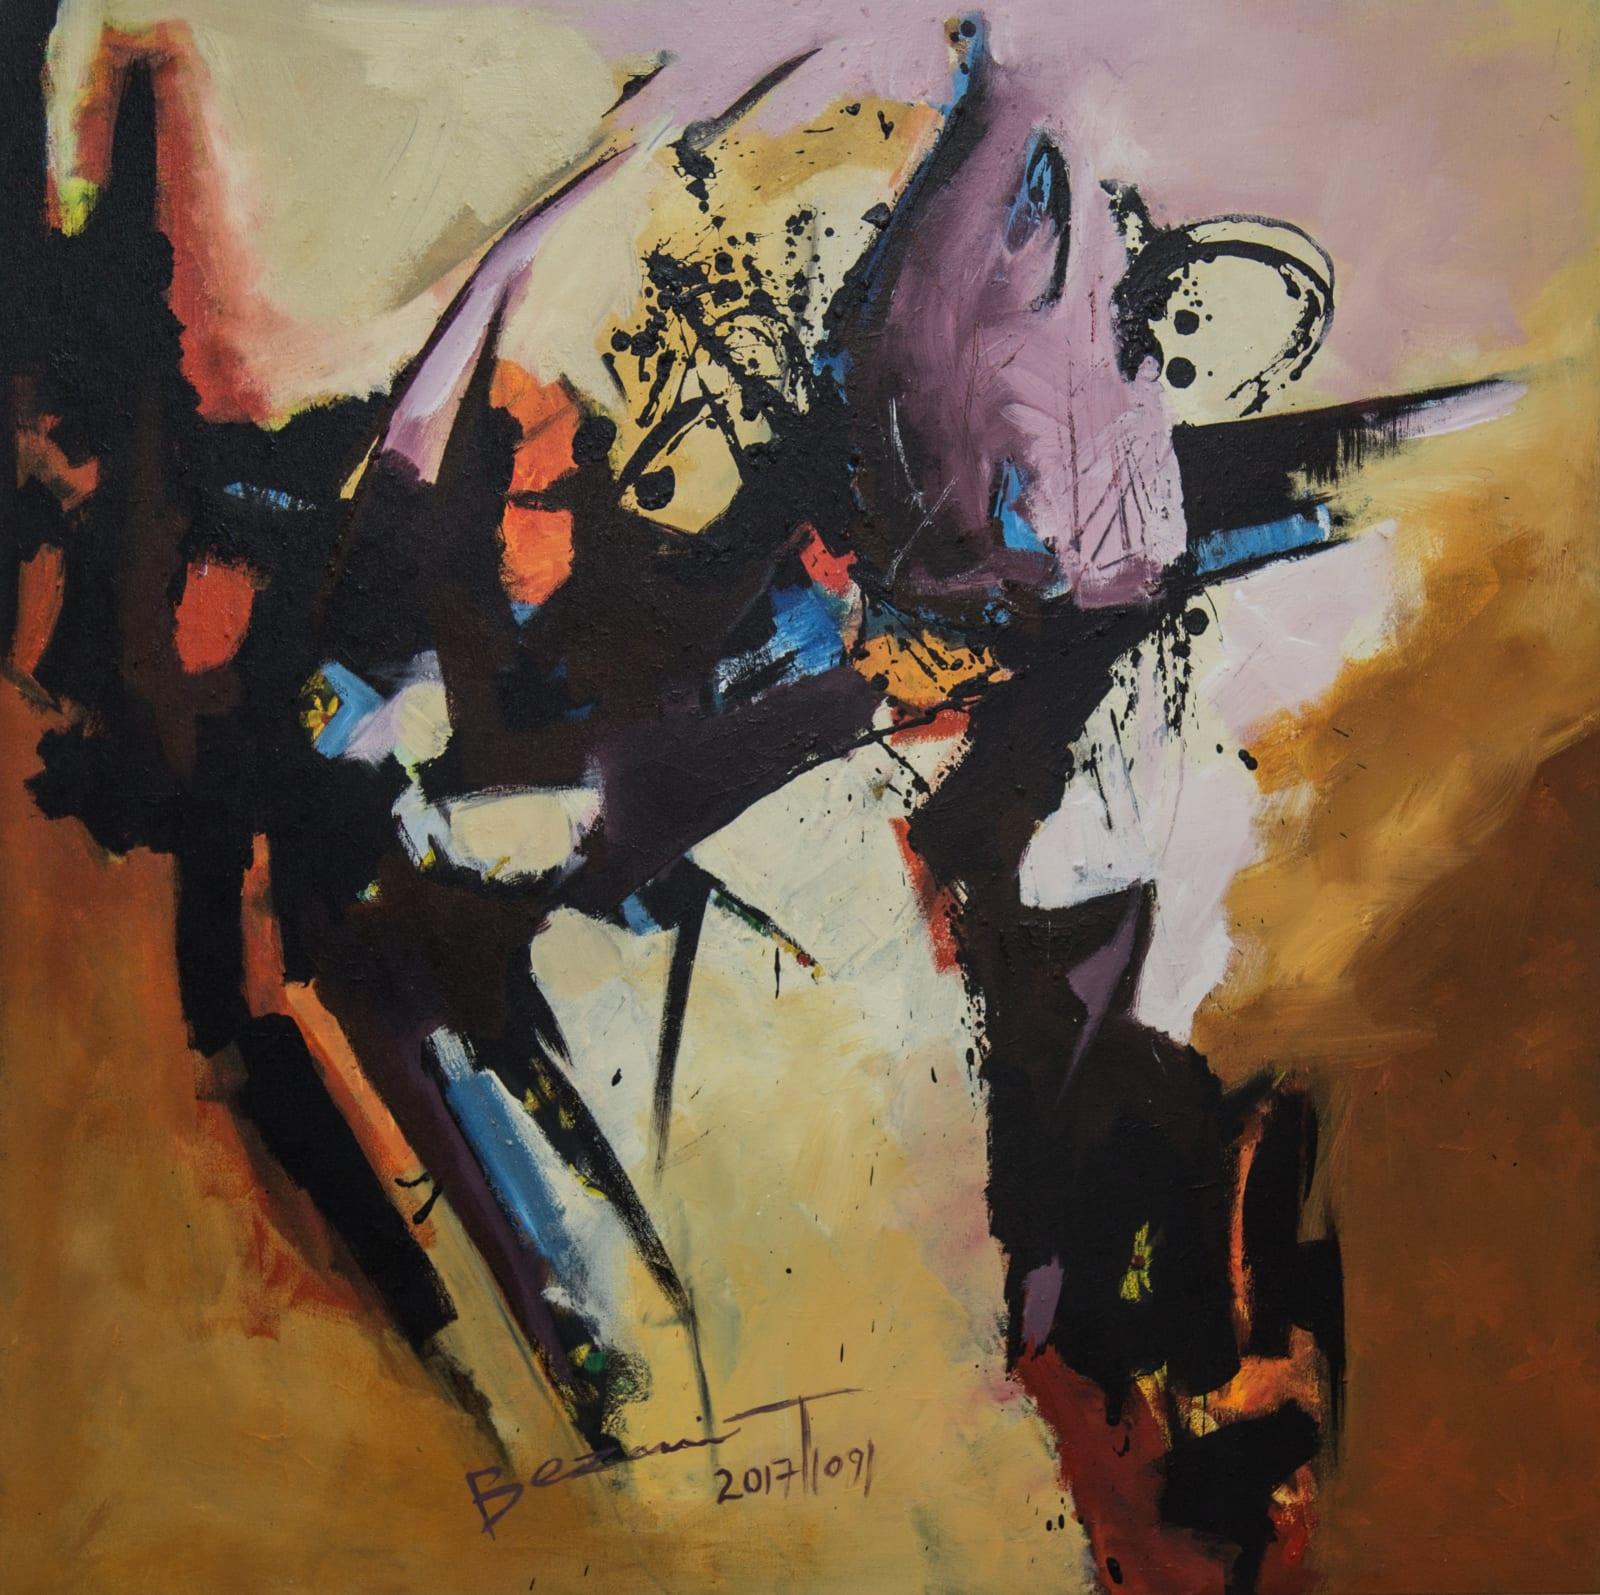 Bezawit Wondwosen, Untitled VIII, 2017